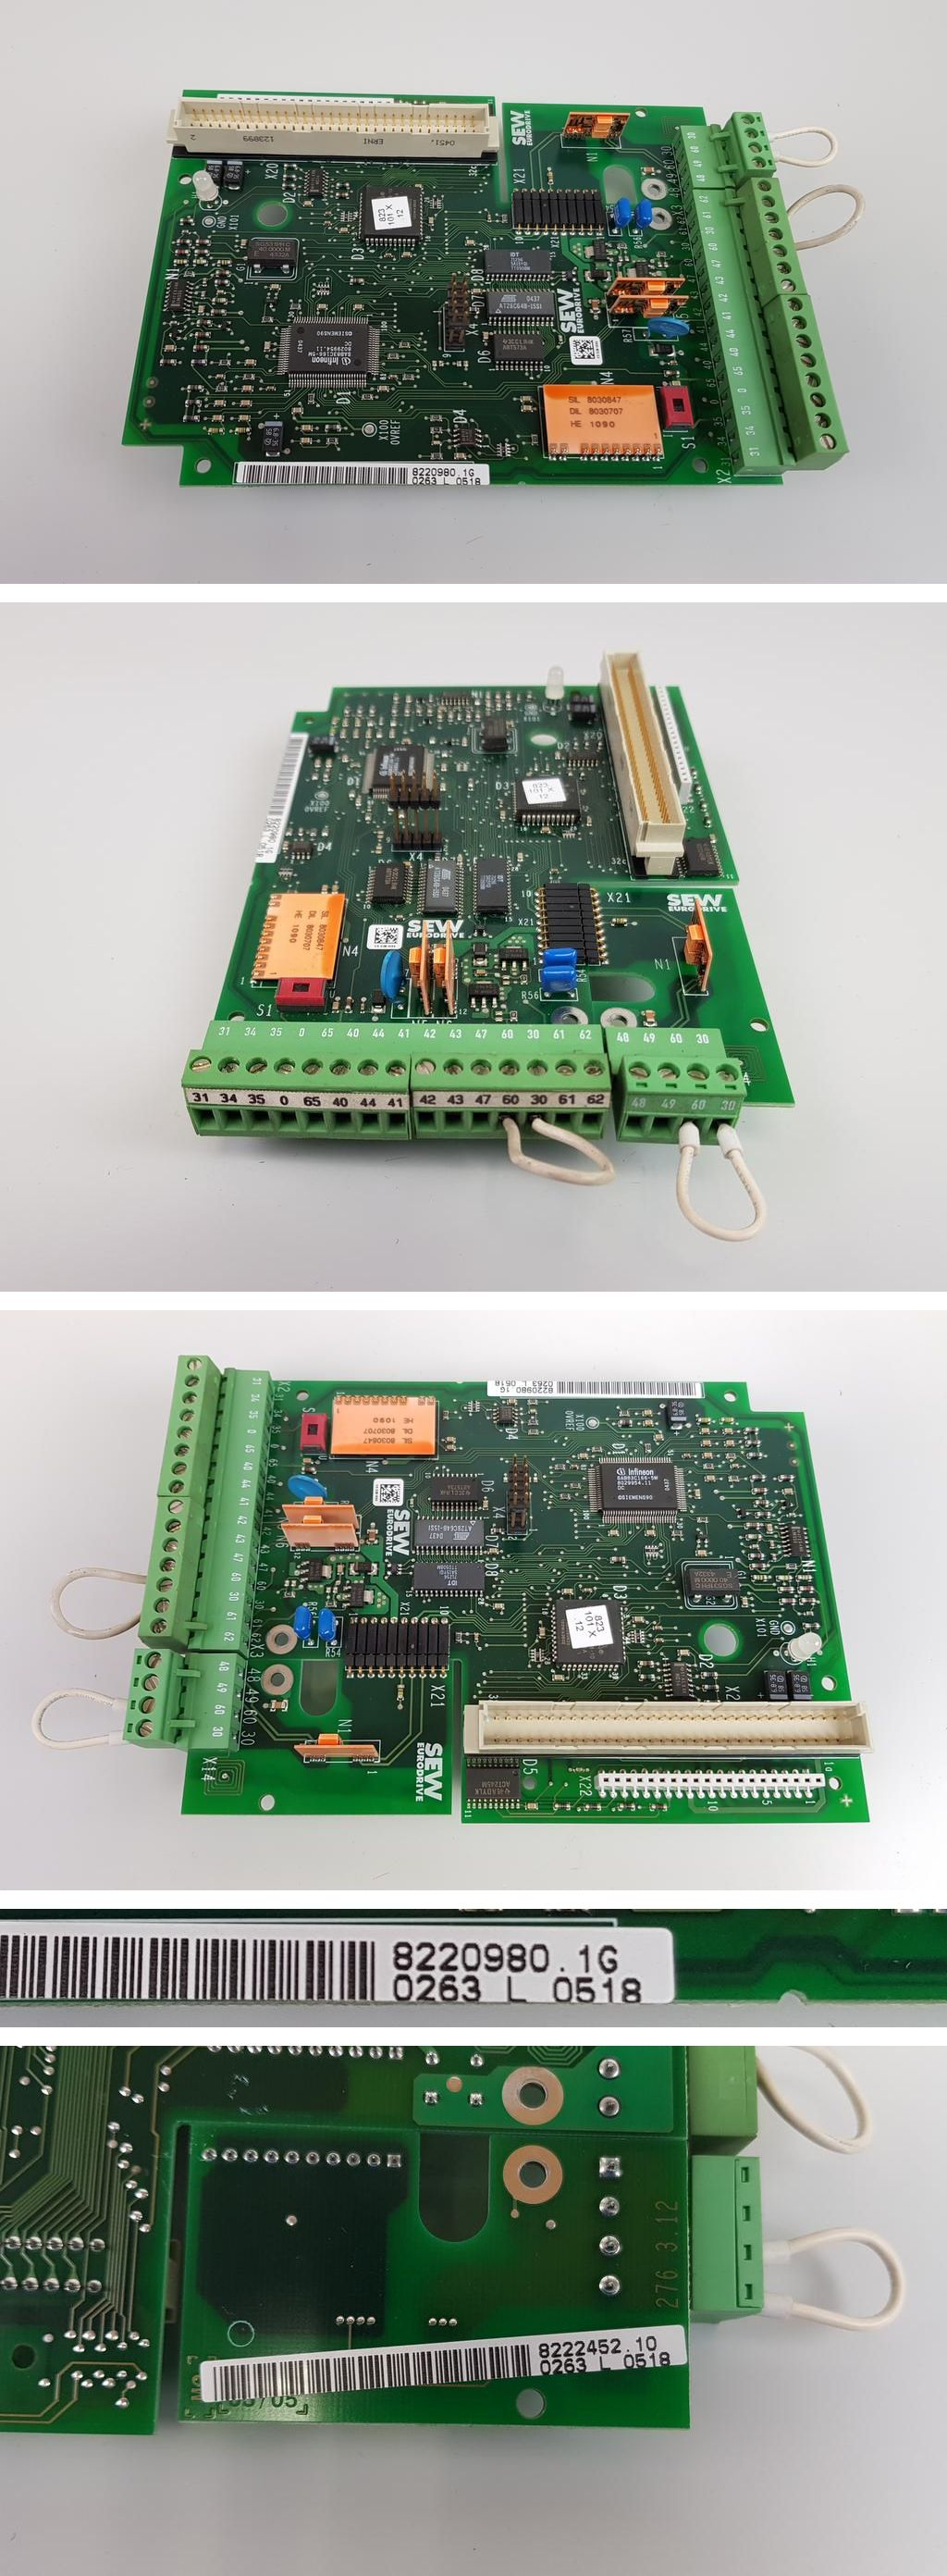 Hammond 1550Z111 Diecast involucro parete spessa, 115 x 64 x 55mm naturale